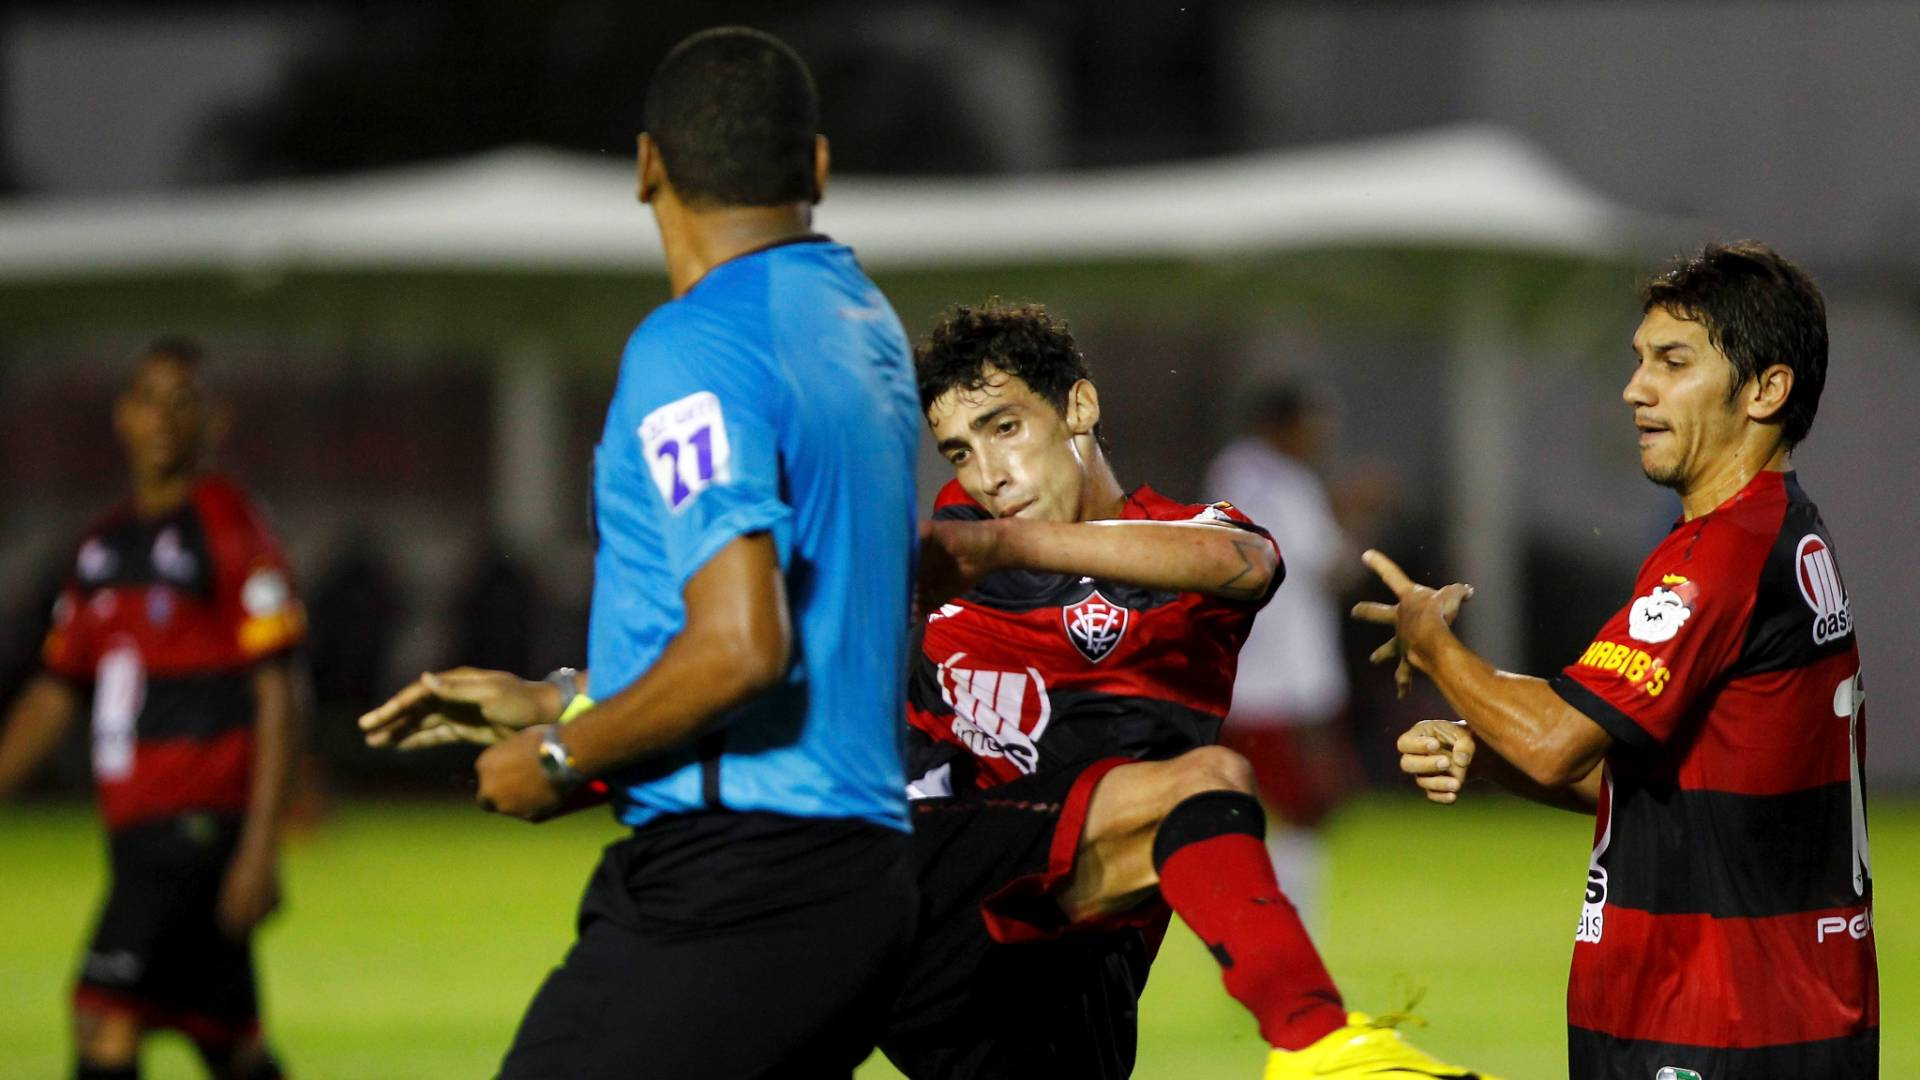 Rildo, do Vitória, tenta agredir o árbitro Cláudio Francisco Lima e Silva após ser expulso da partida contra o Boa (30/07/2011)